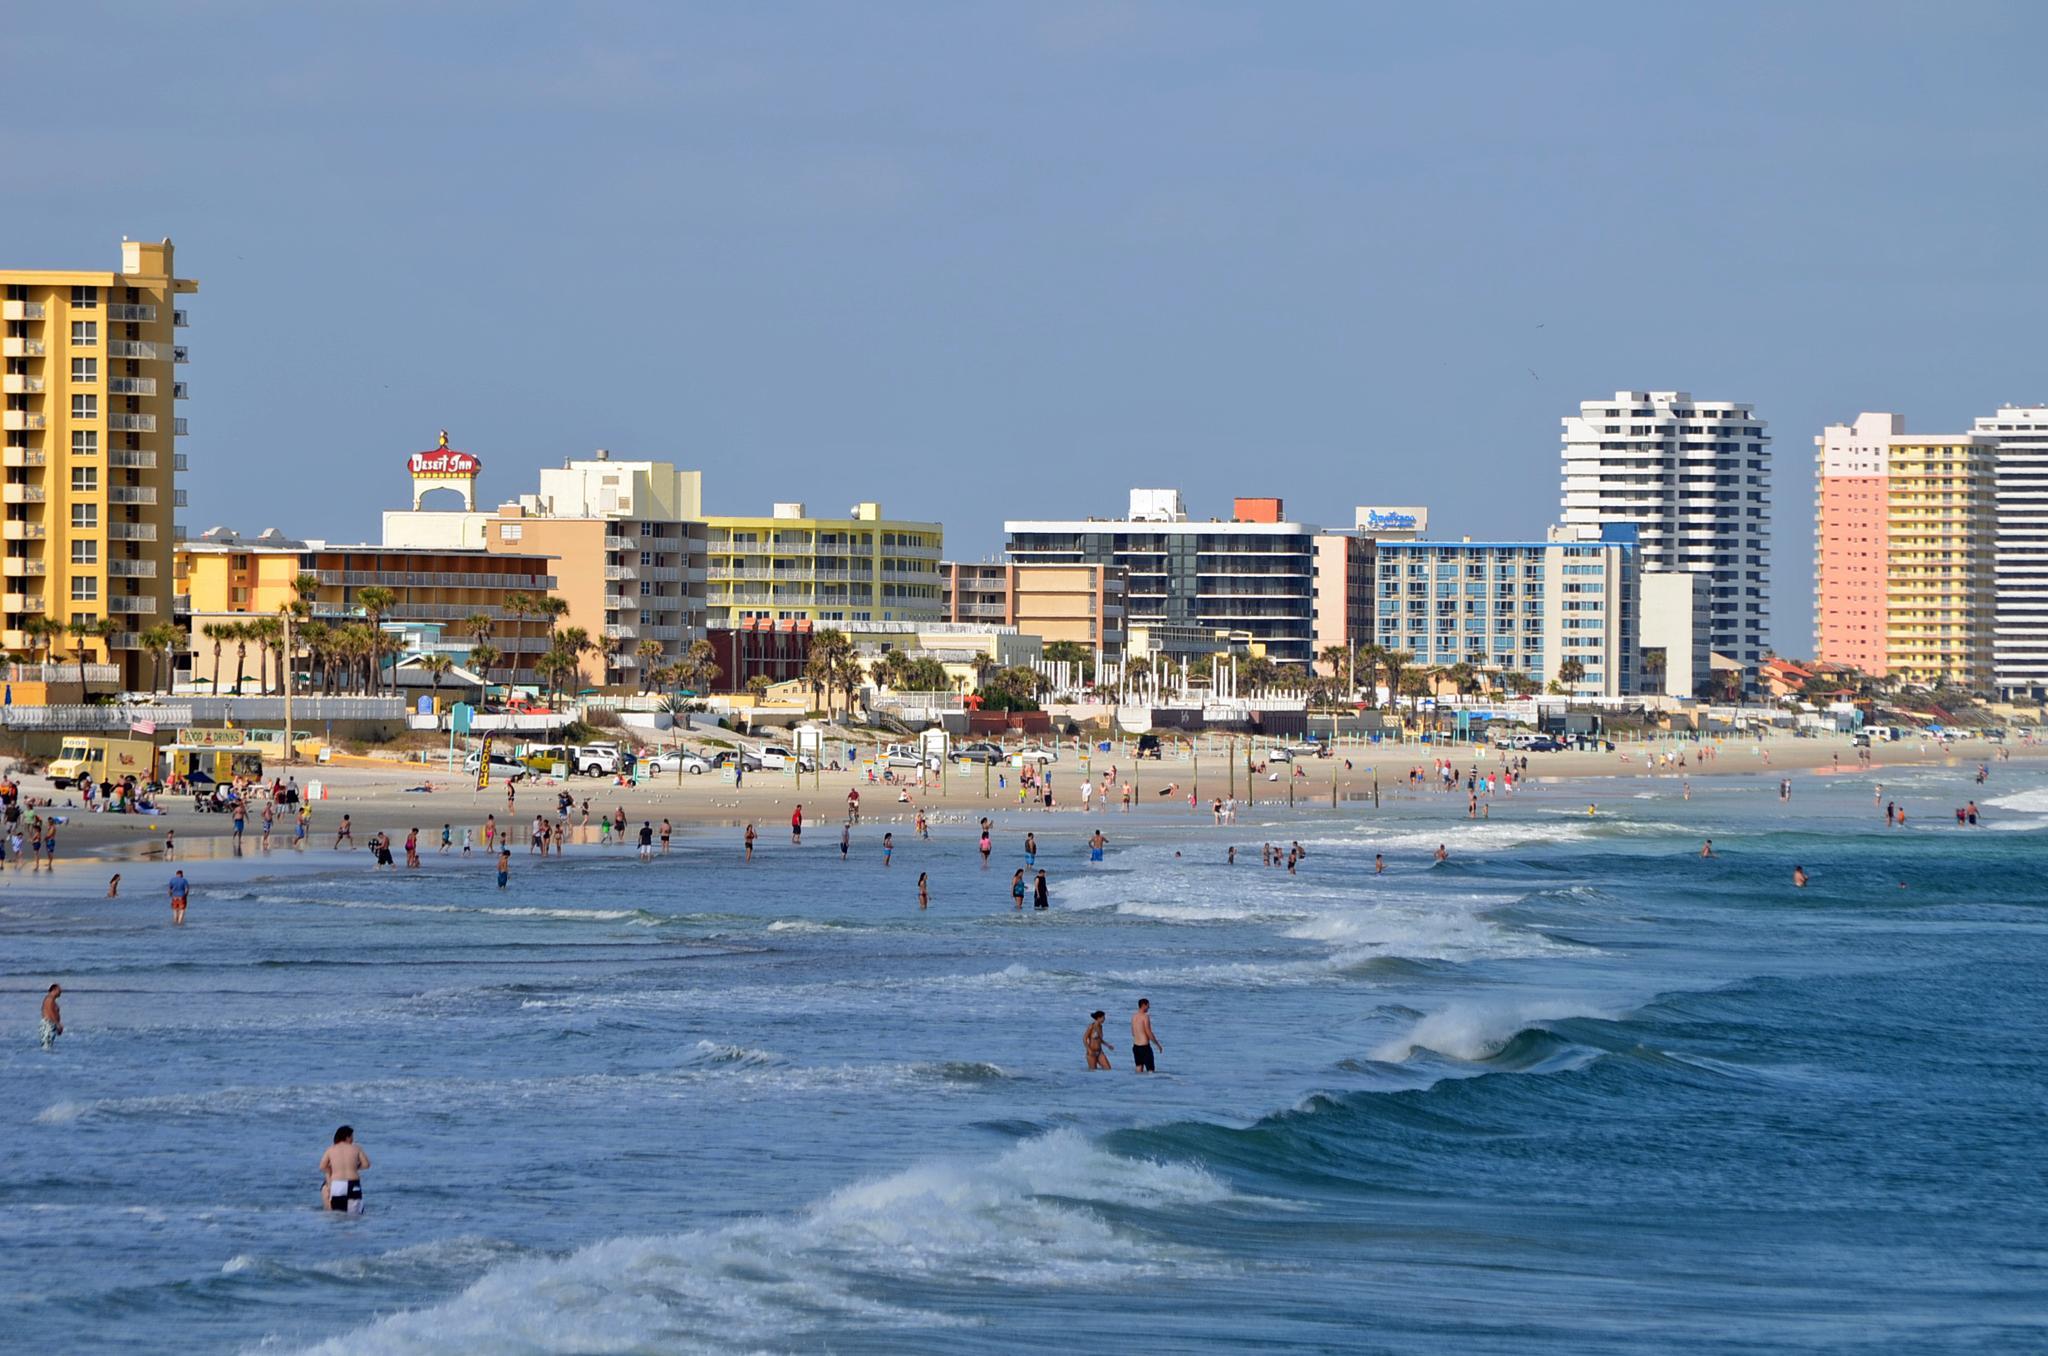 Daytona Beach by laura.hammondkingsley